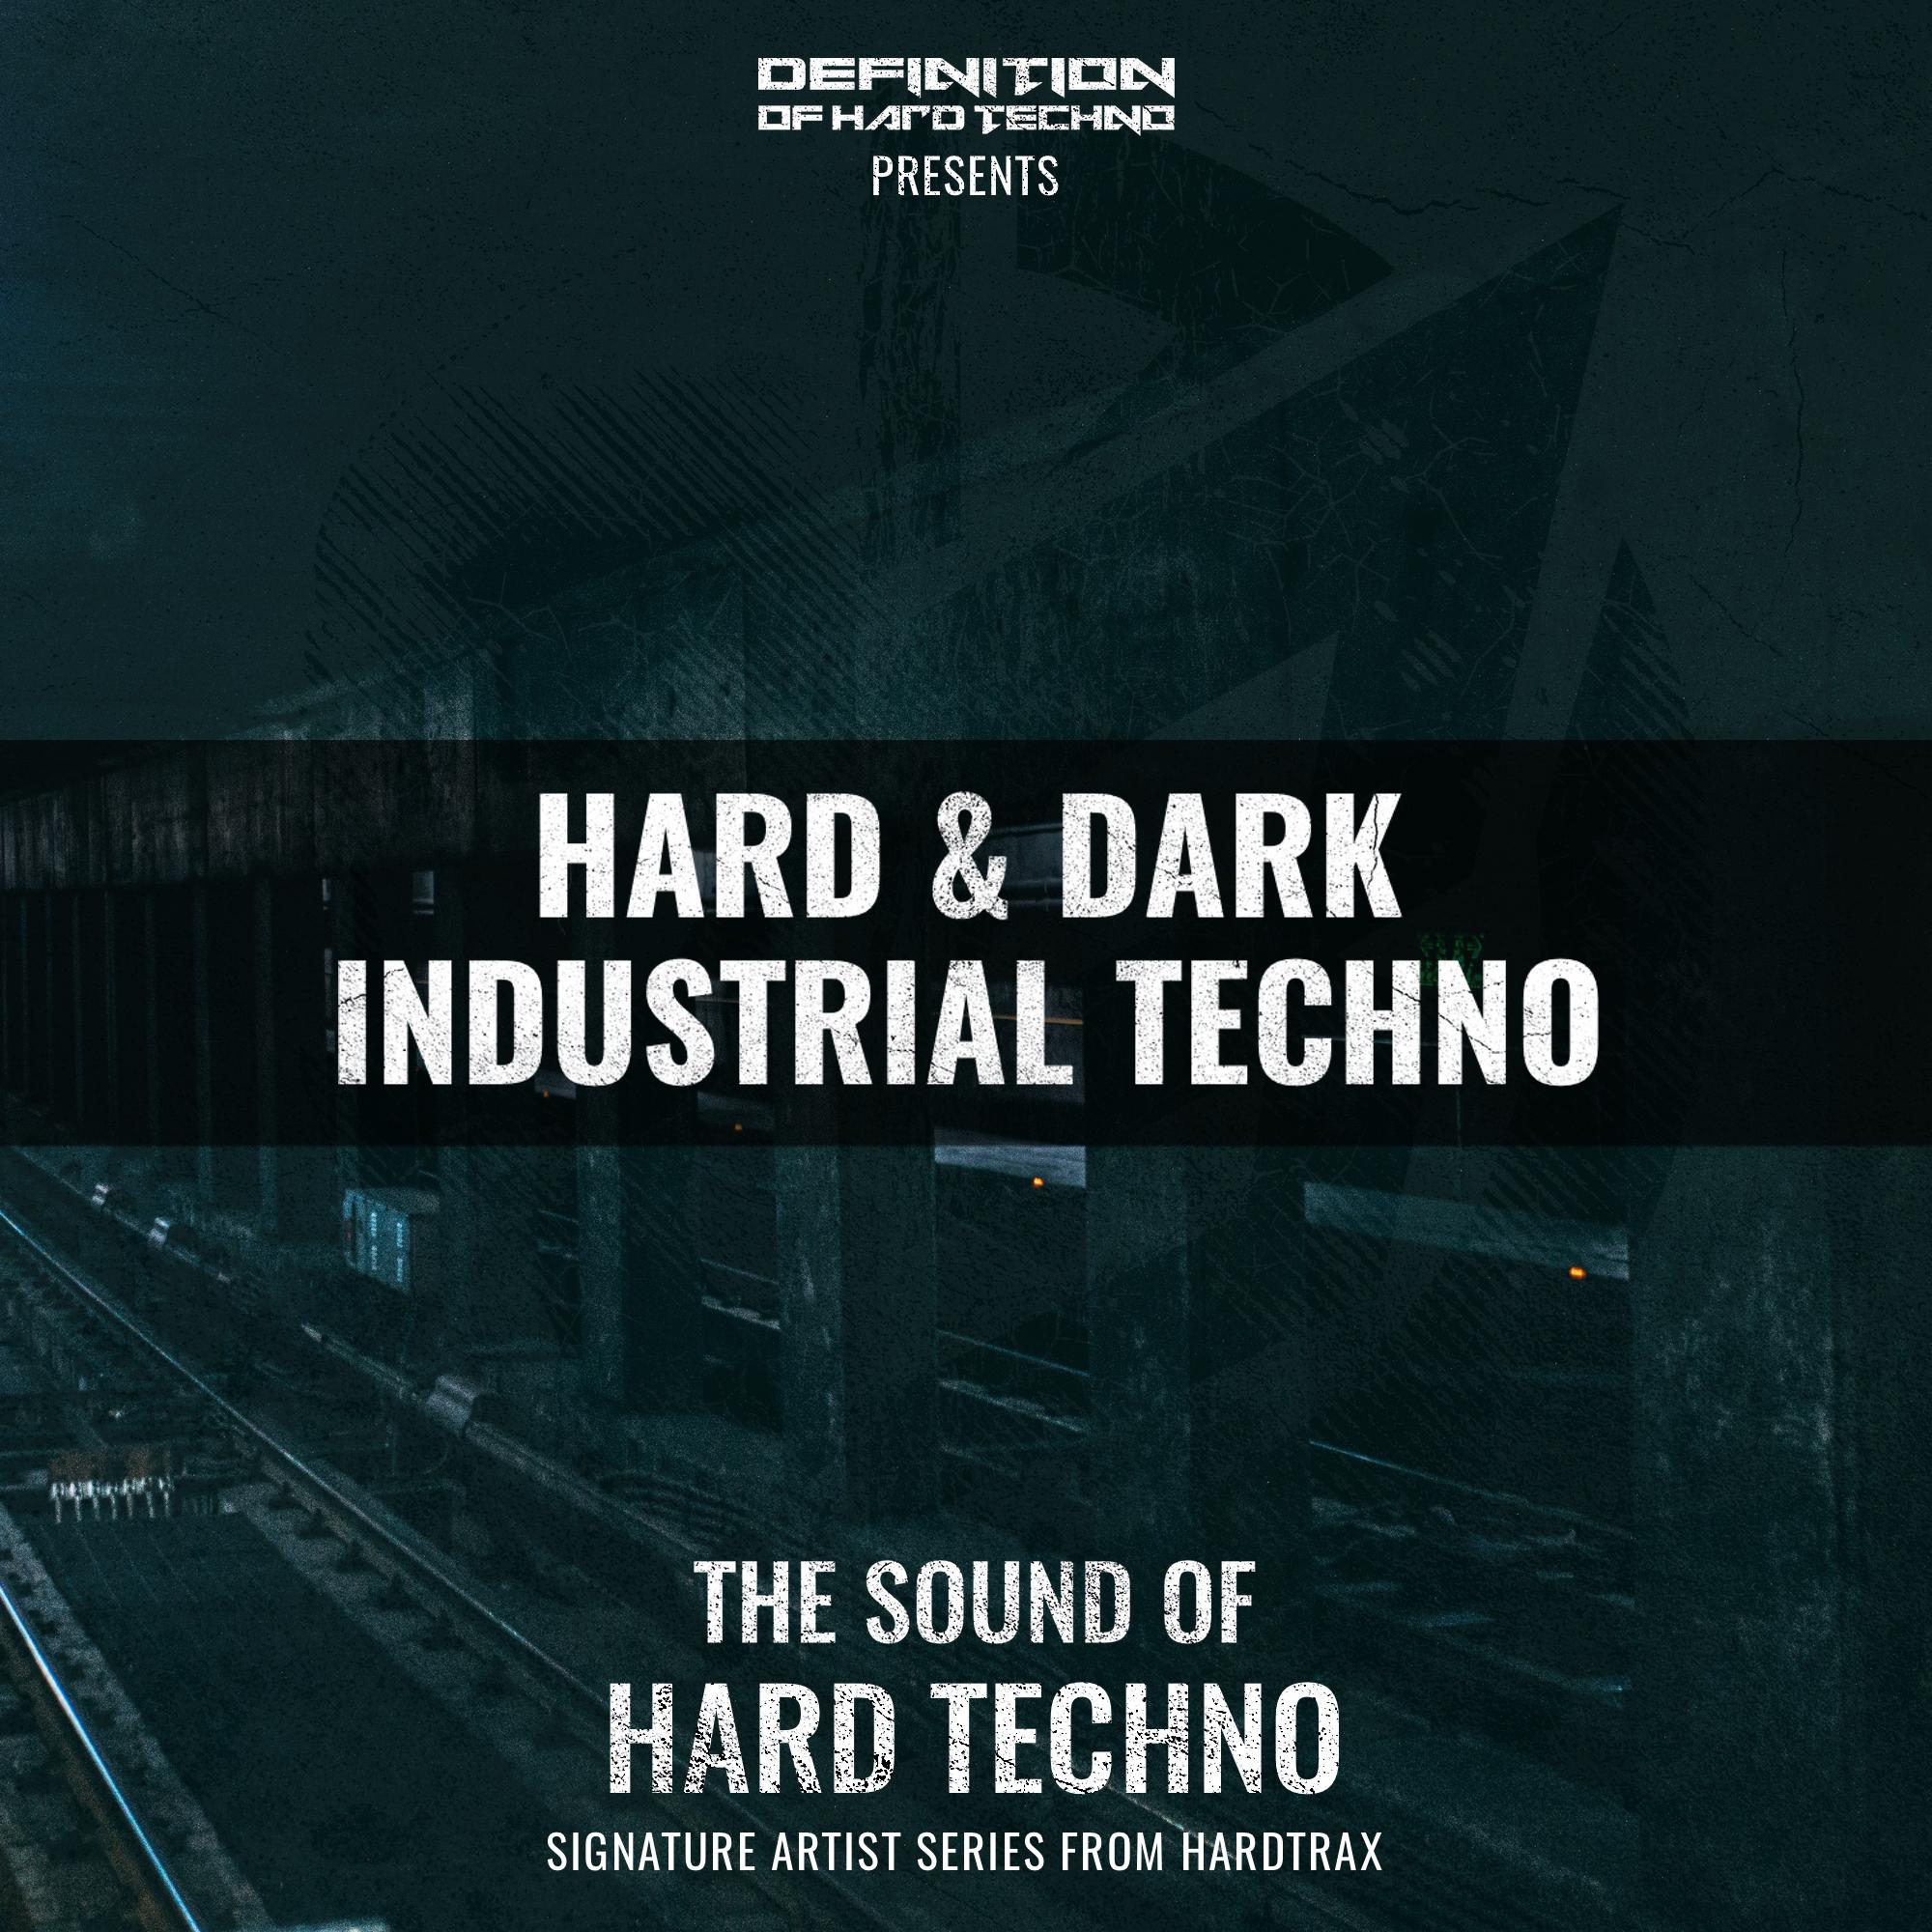 Hard & Dark Industrial Techno